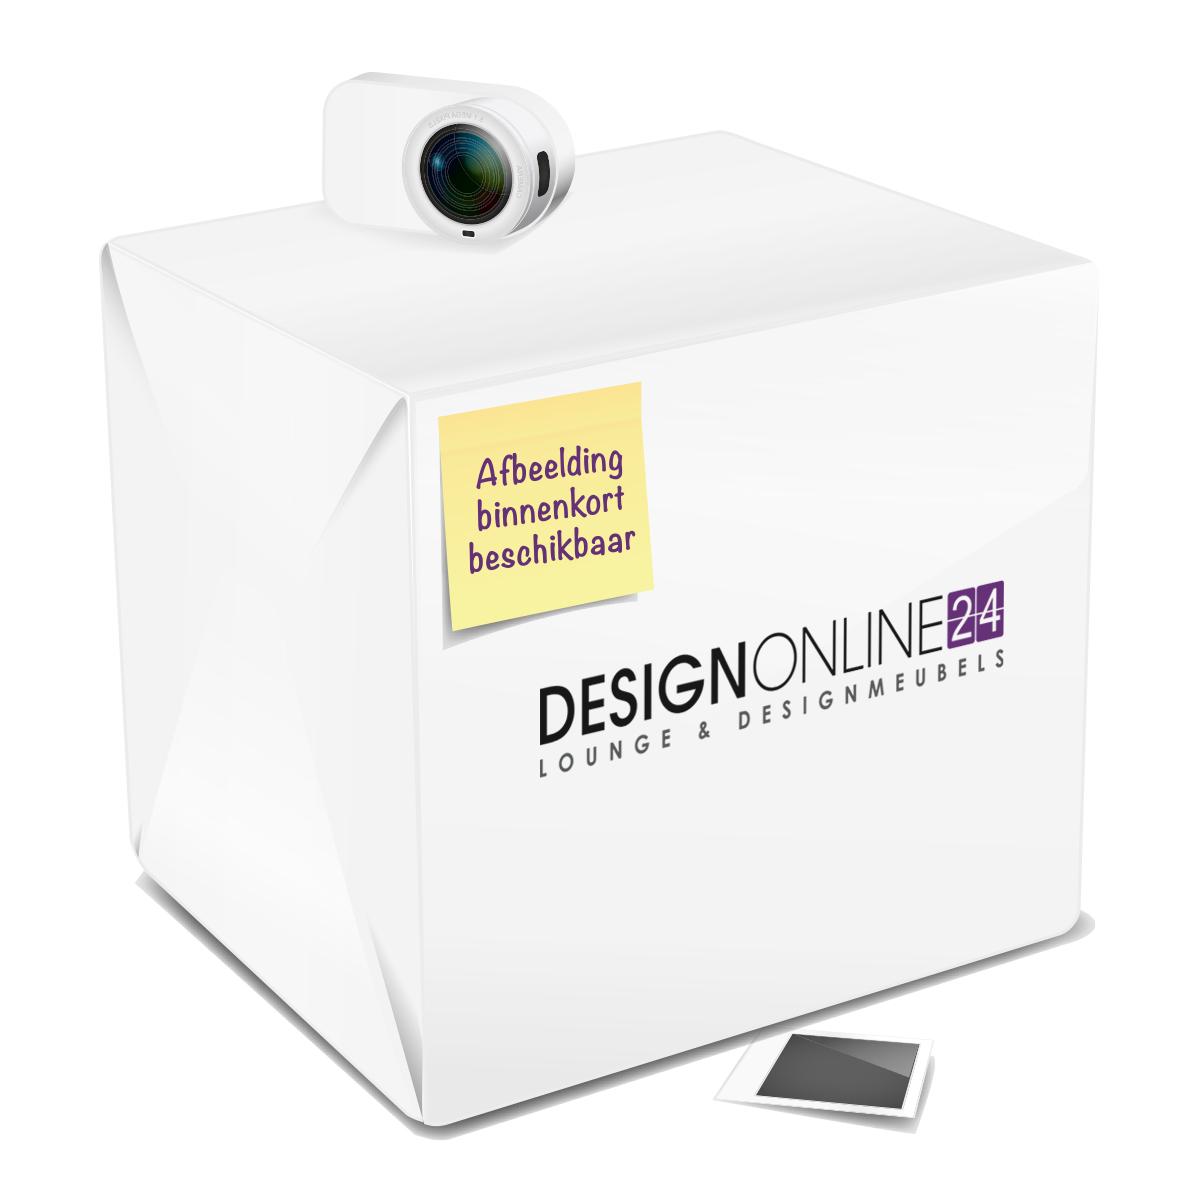 24Designs 24Designs Loungeset 6 Personen - Pomonte - Parelwit Polyrattan Wicker met Grijze kussens